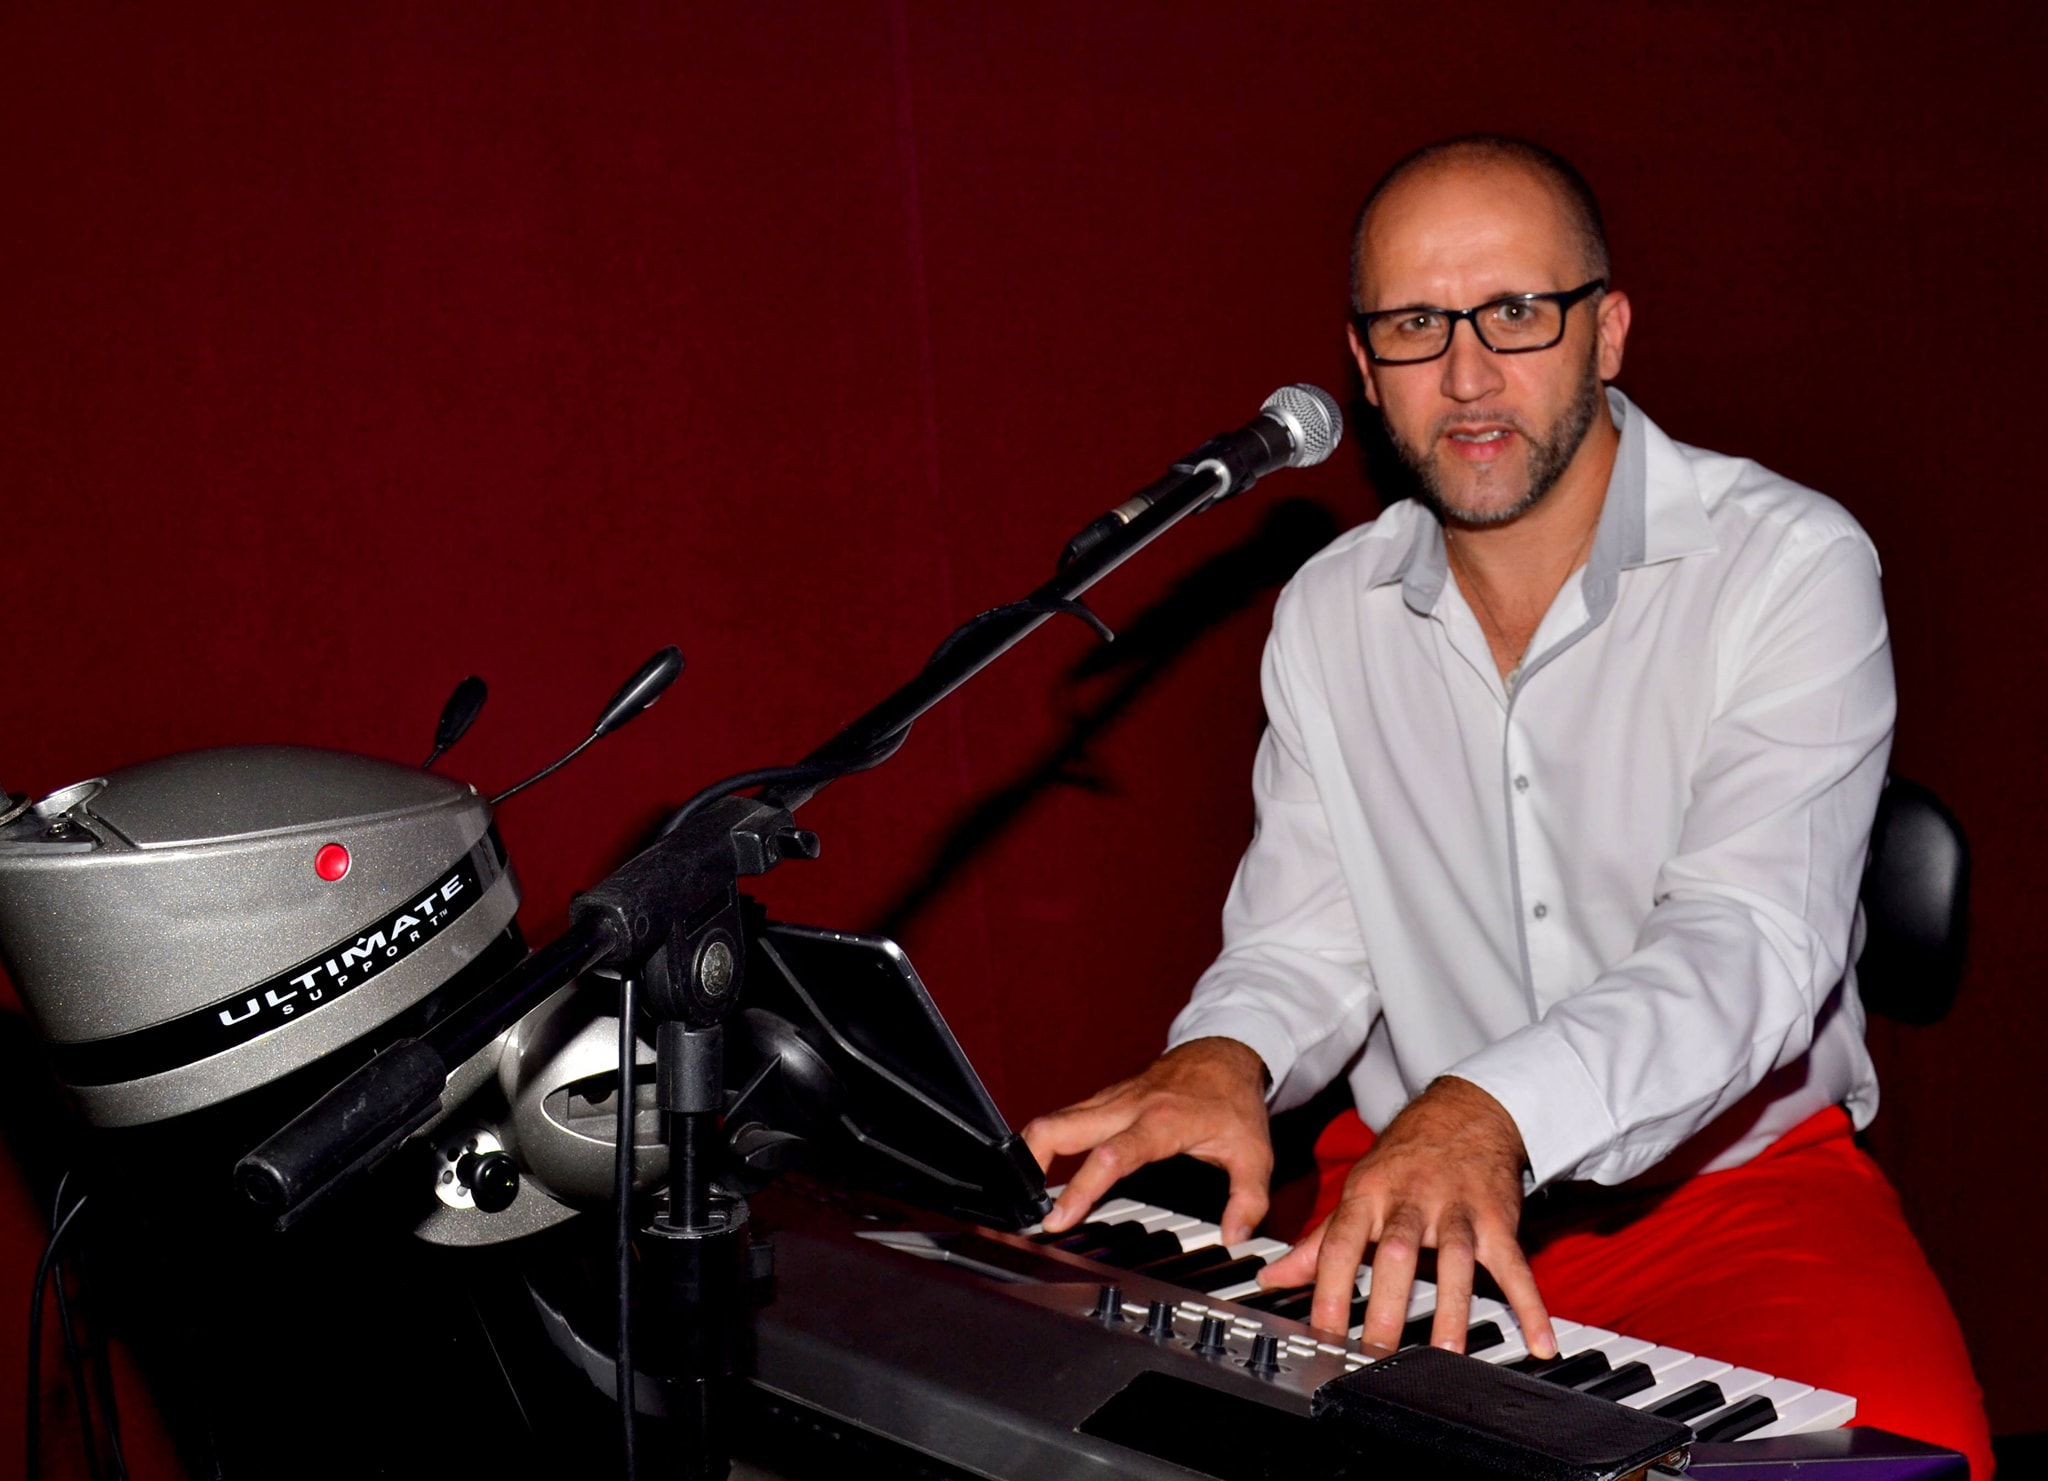 DELALIEUX PIANO